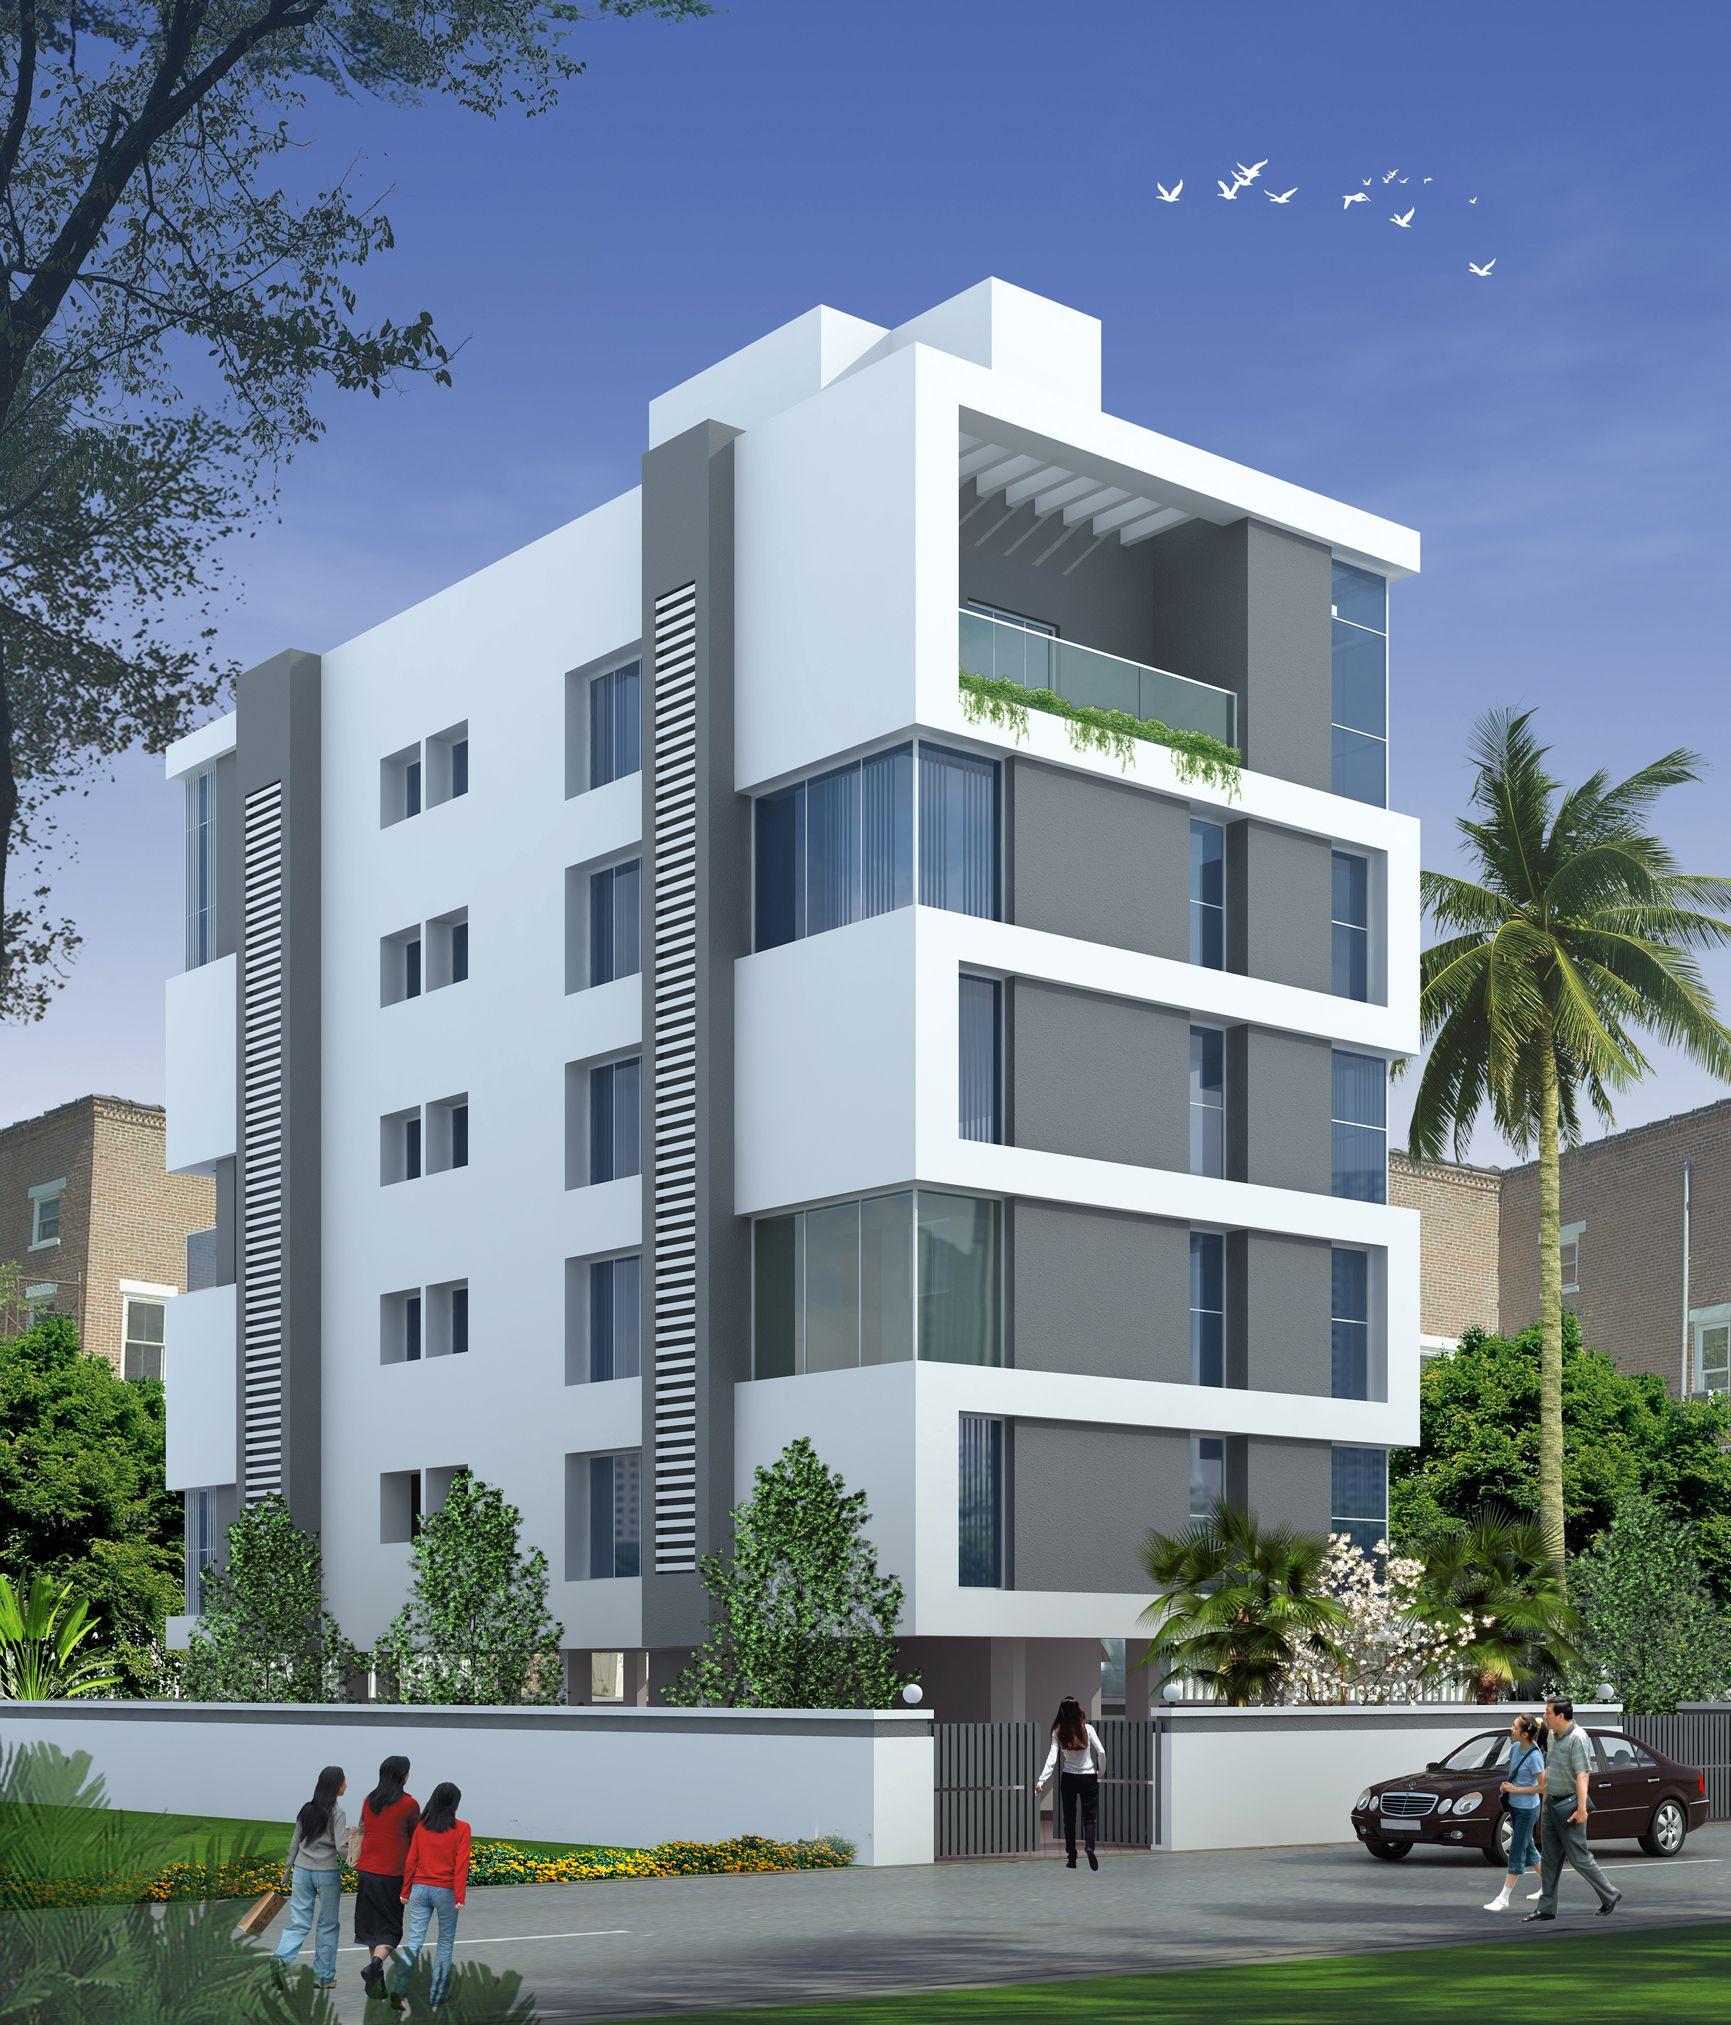 2 & 4 BHK Super Luxurious Apartments